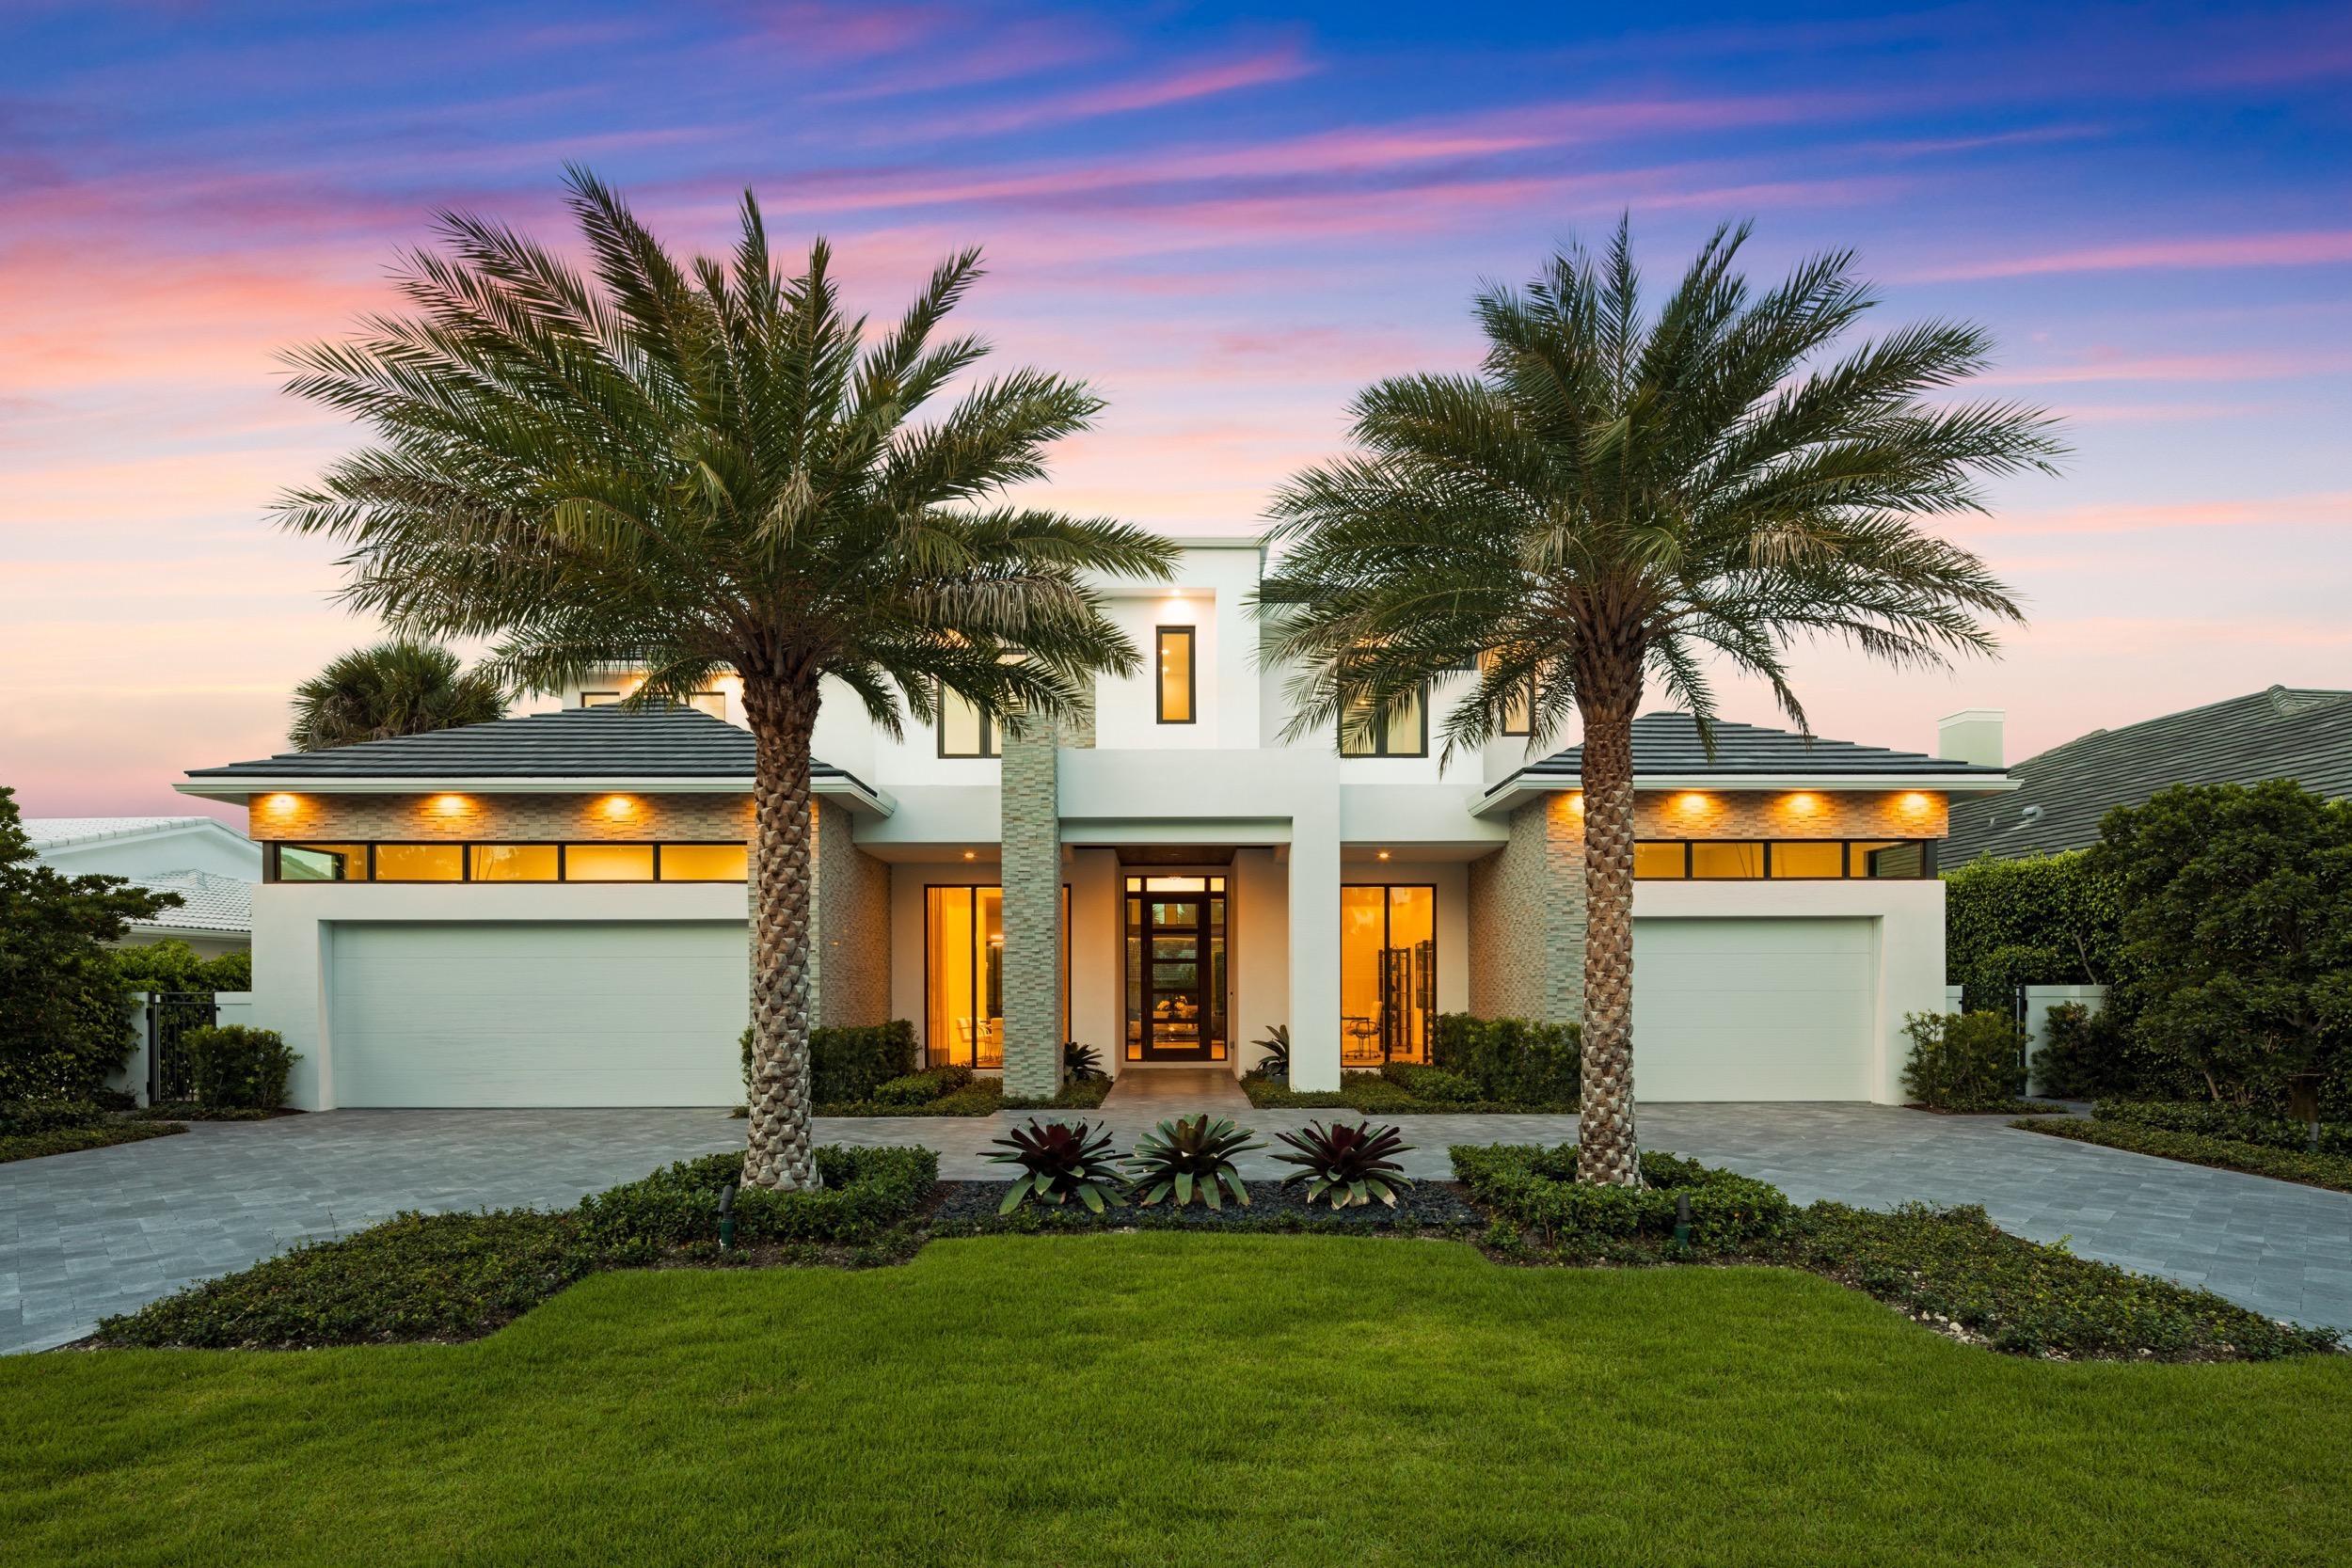 2424 Queen Palm Road, Boca Raton, FL 33432